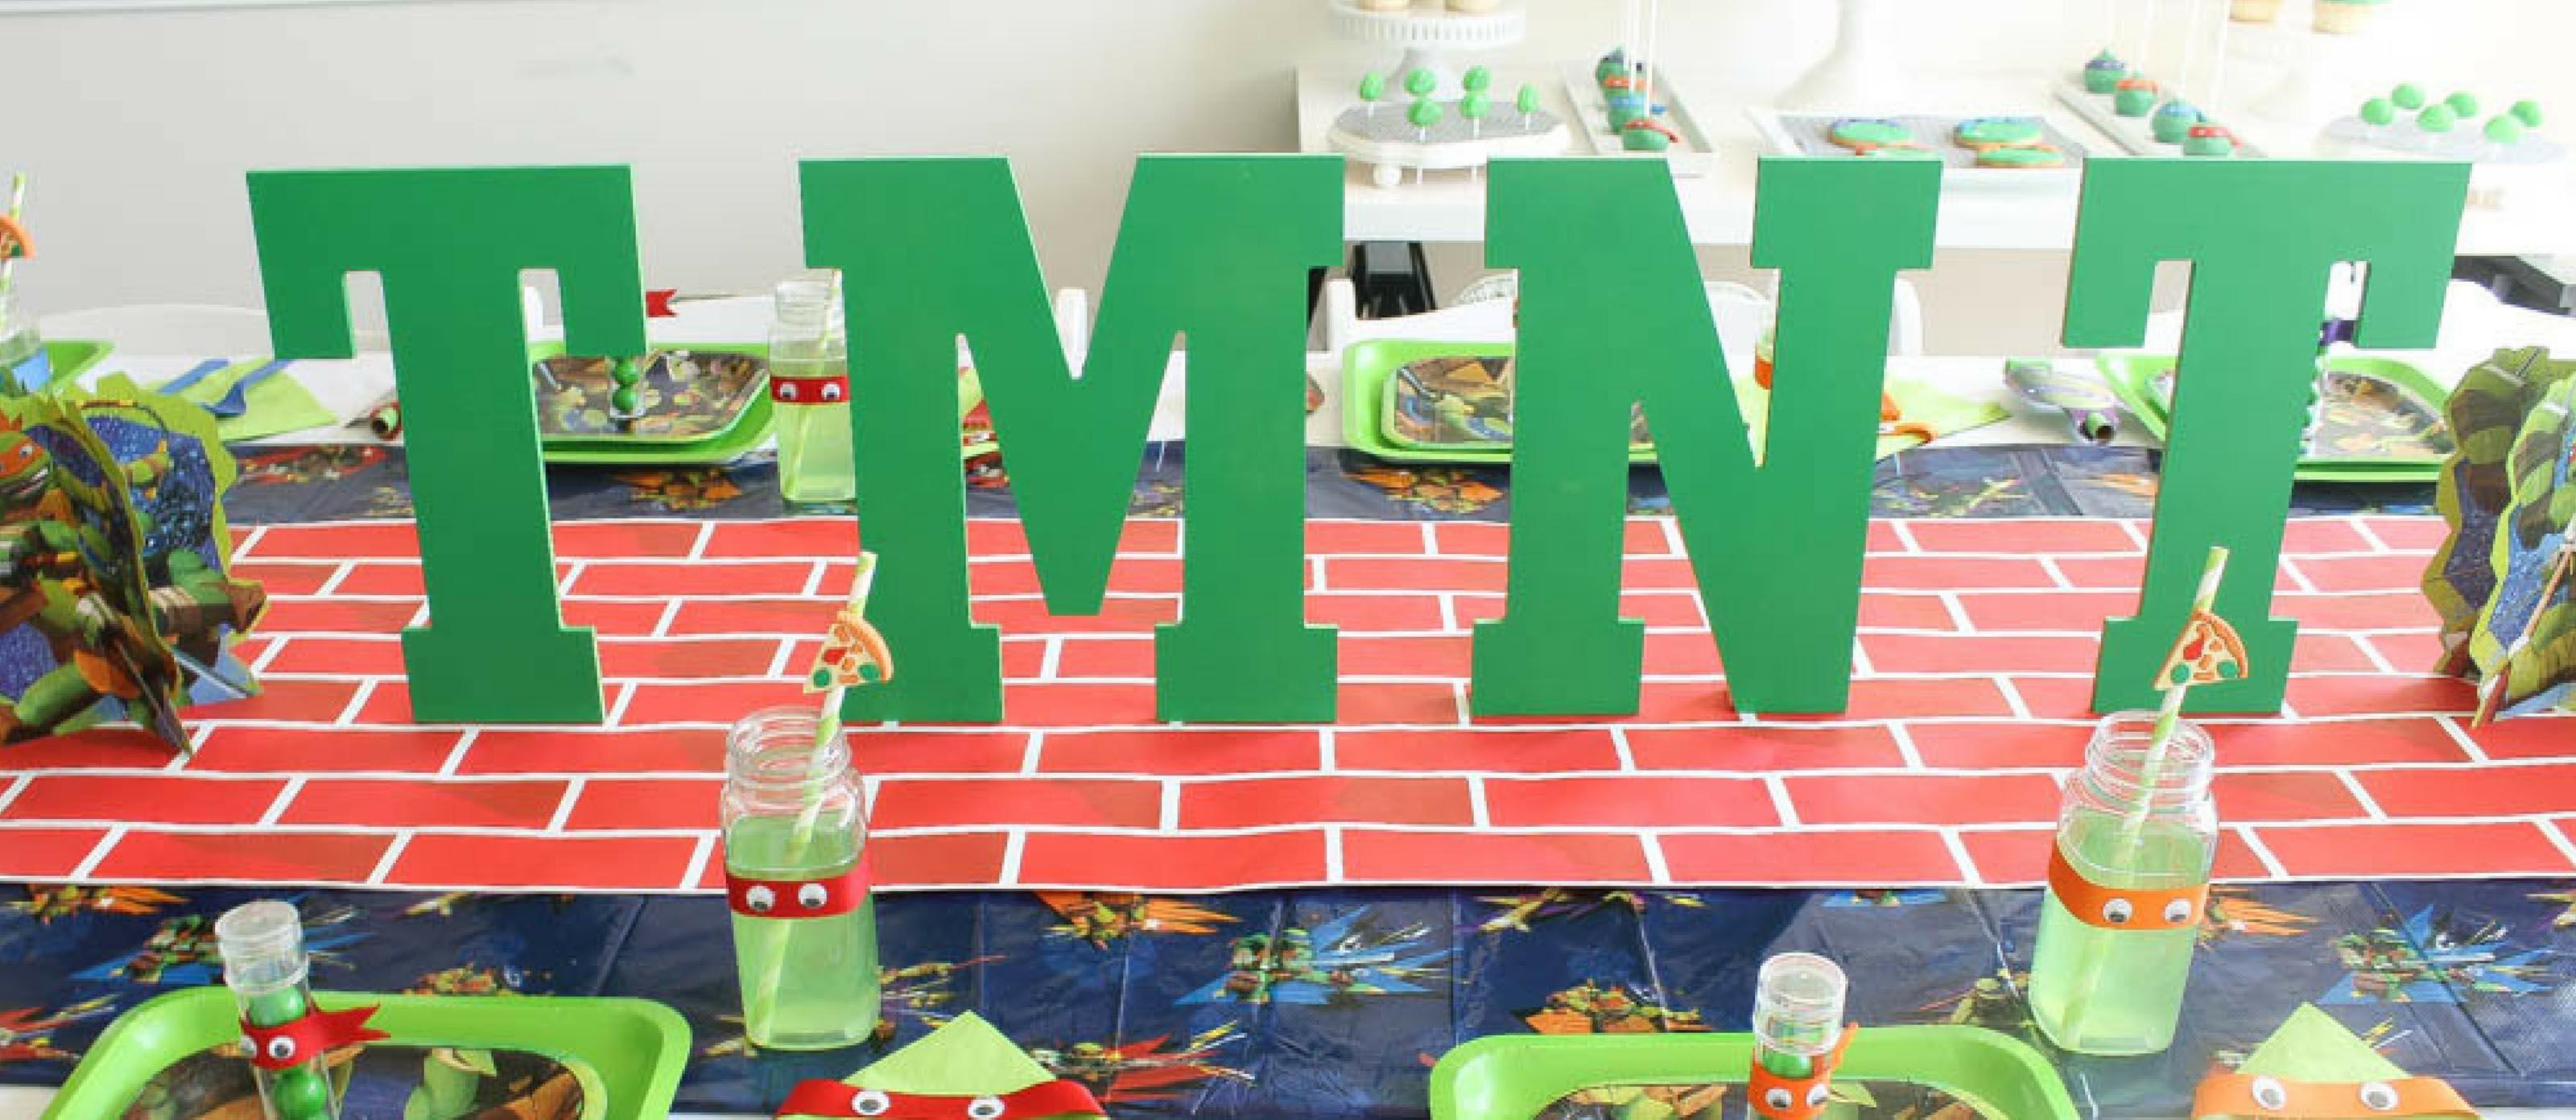 Pleasant Teenage Mutant Ninja Turtles Birthday Party Fun365 Personalised Birthday Cards Petedlily Jamesorg